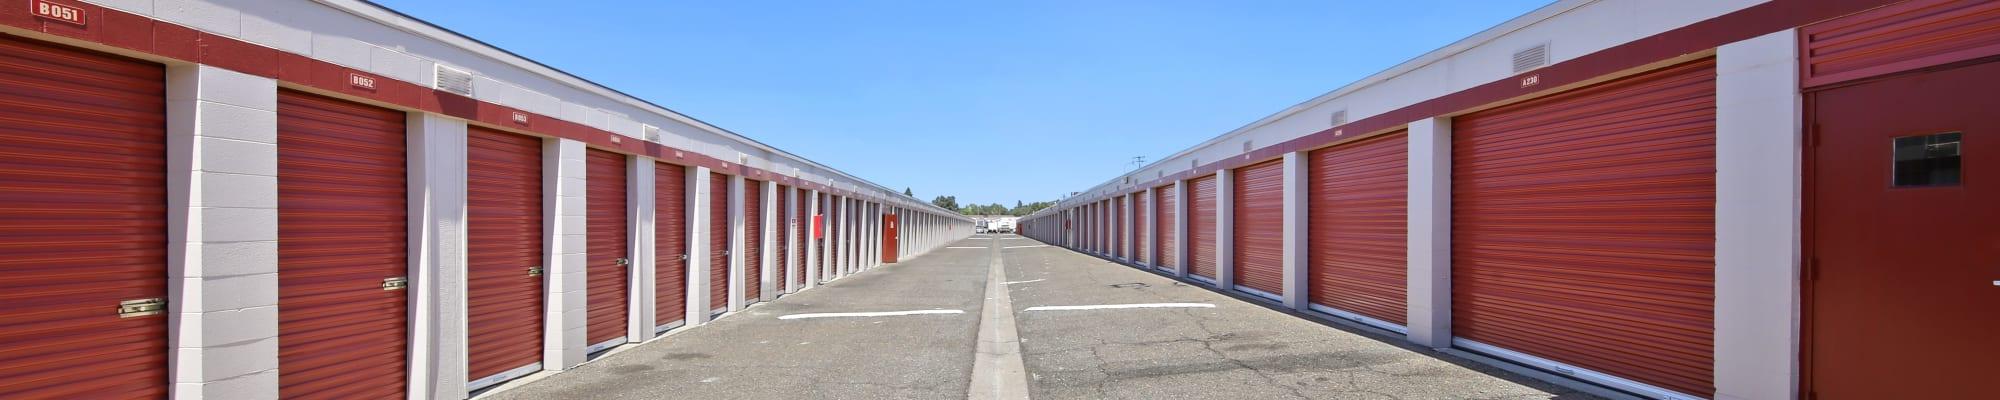 Contact us at Storage Star Rancho Cordova in Rancho Cordova, California